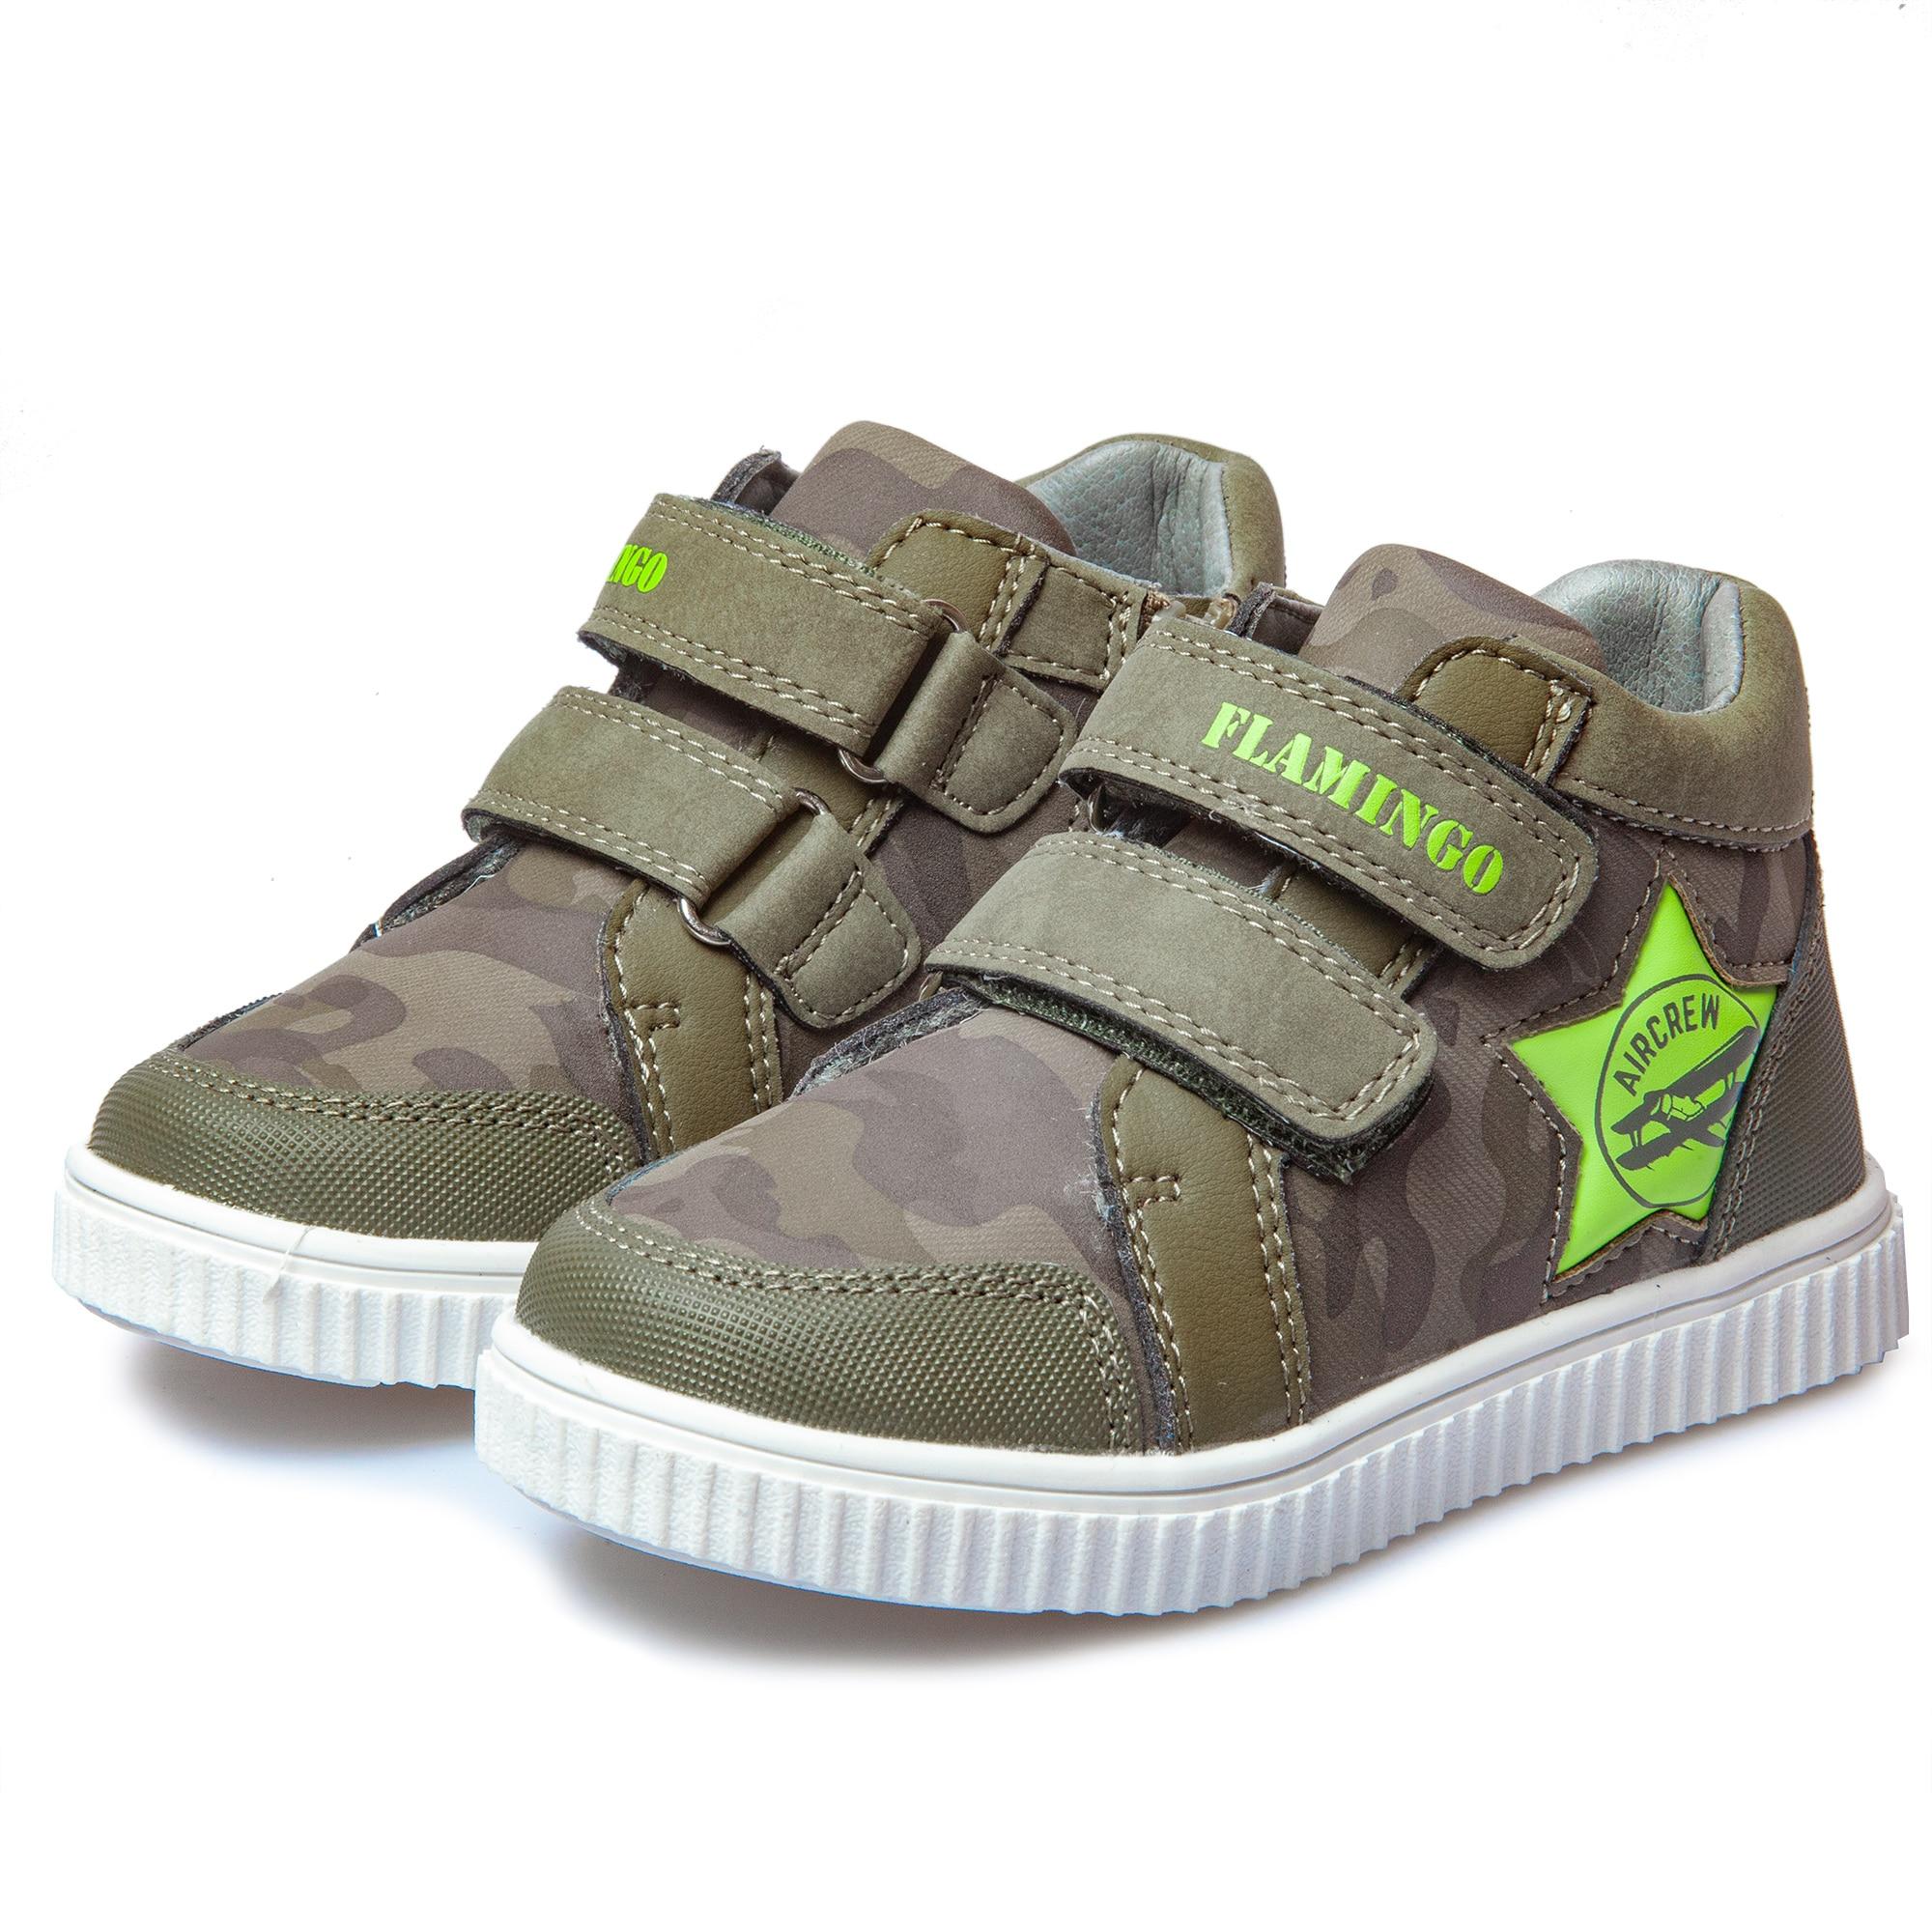 Flamingo shoes 92B-XY-1662 shoes for children 22-27 # цены онлайн